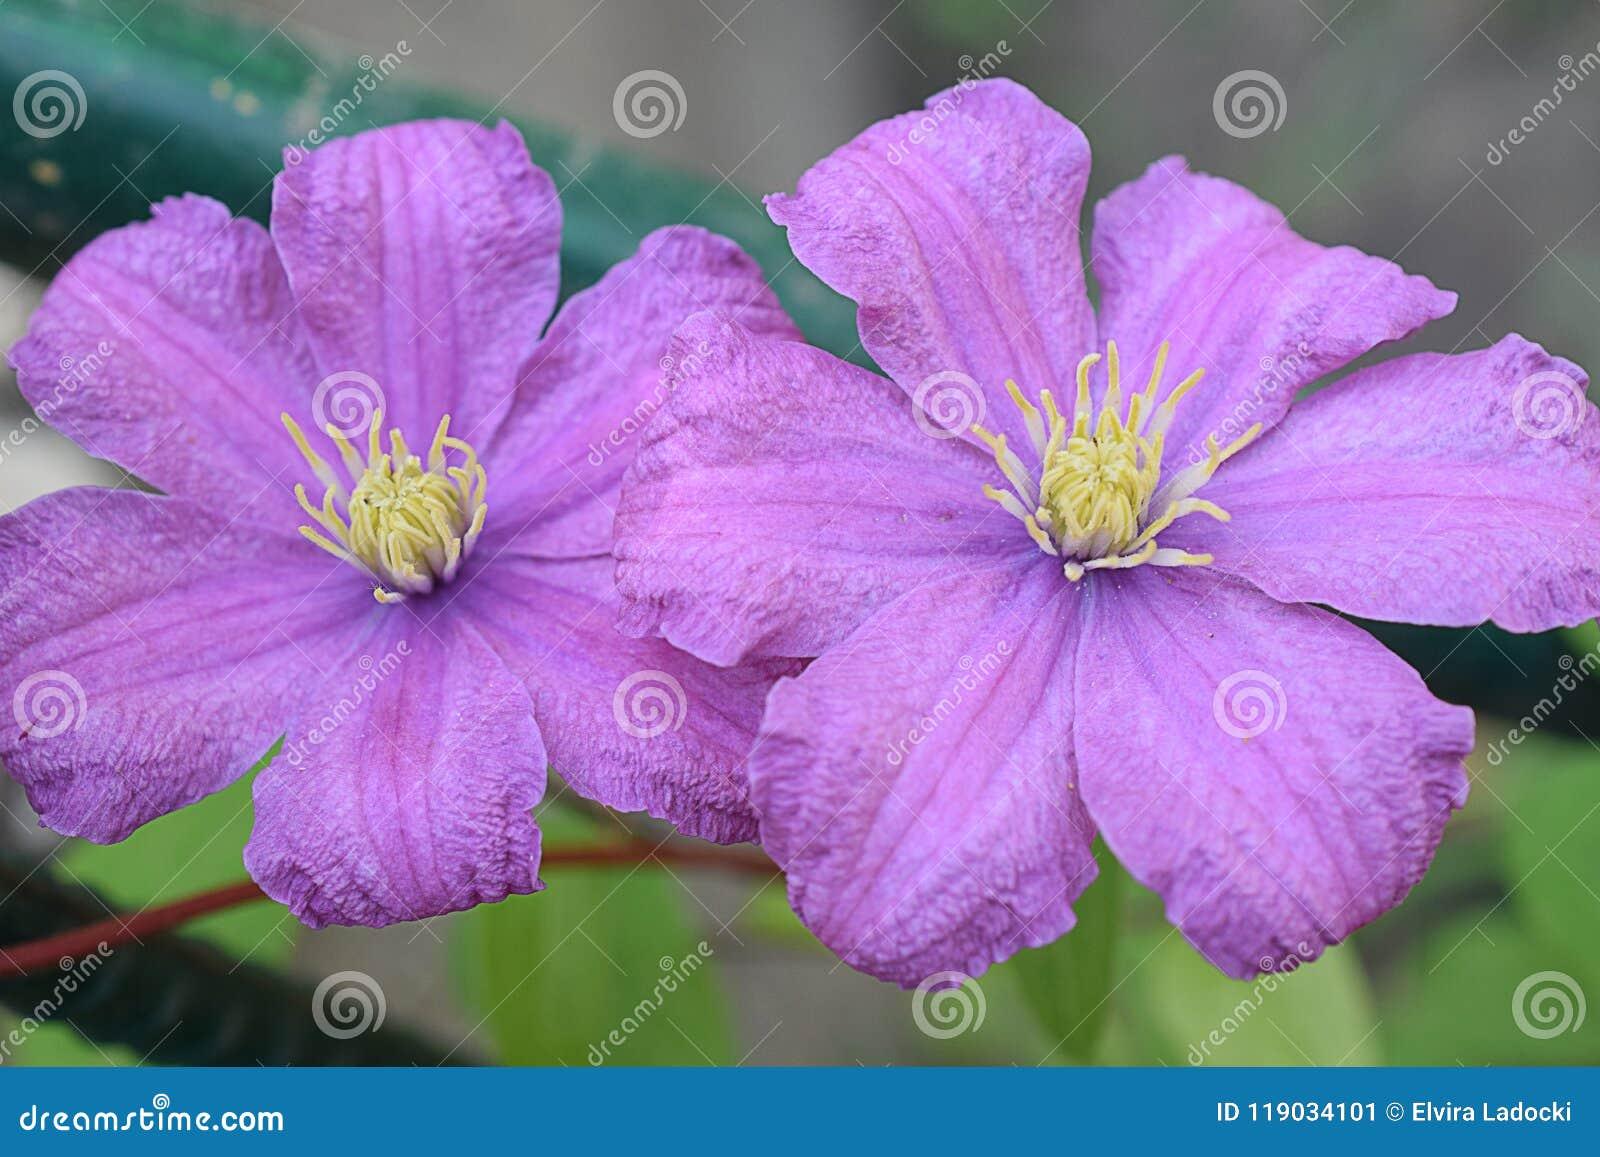 Very pretty pink flowers close up in my garden stock image image very pretty pink flowers close up in my garden mightylinksfo